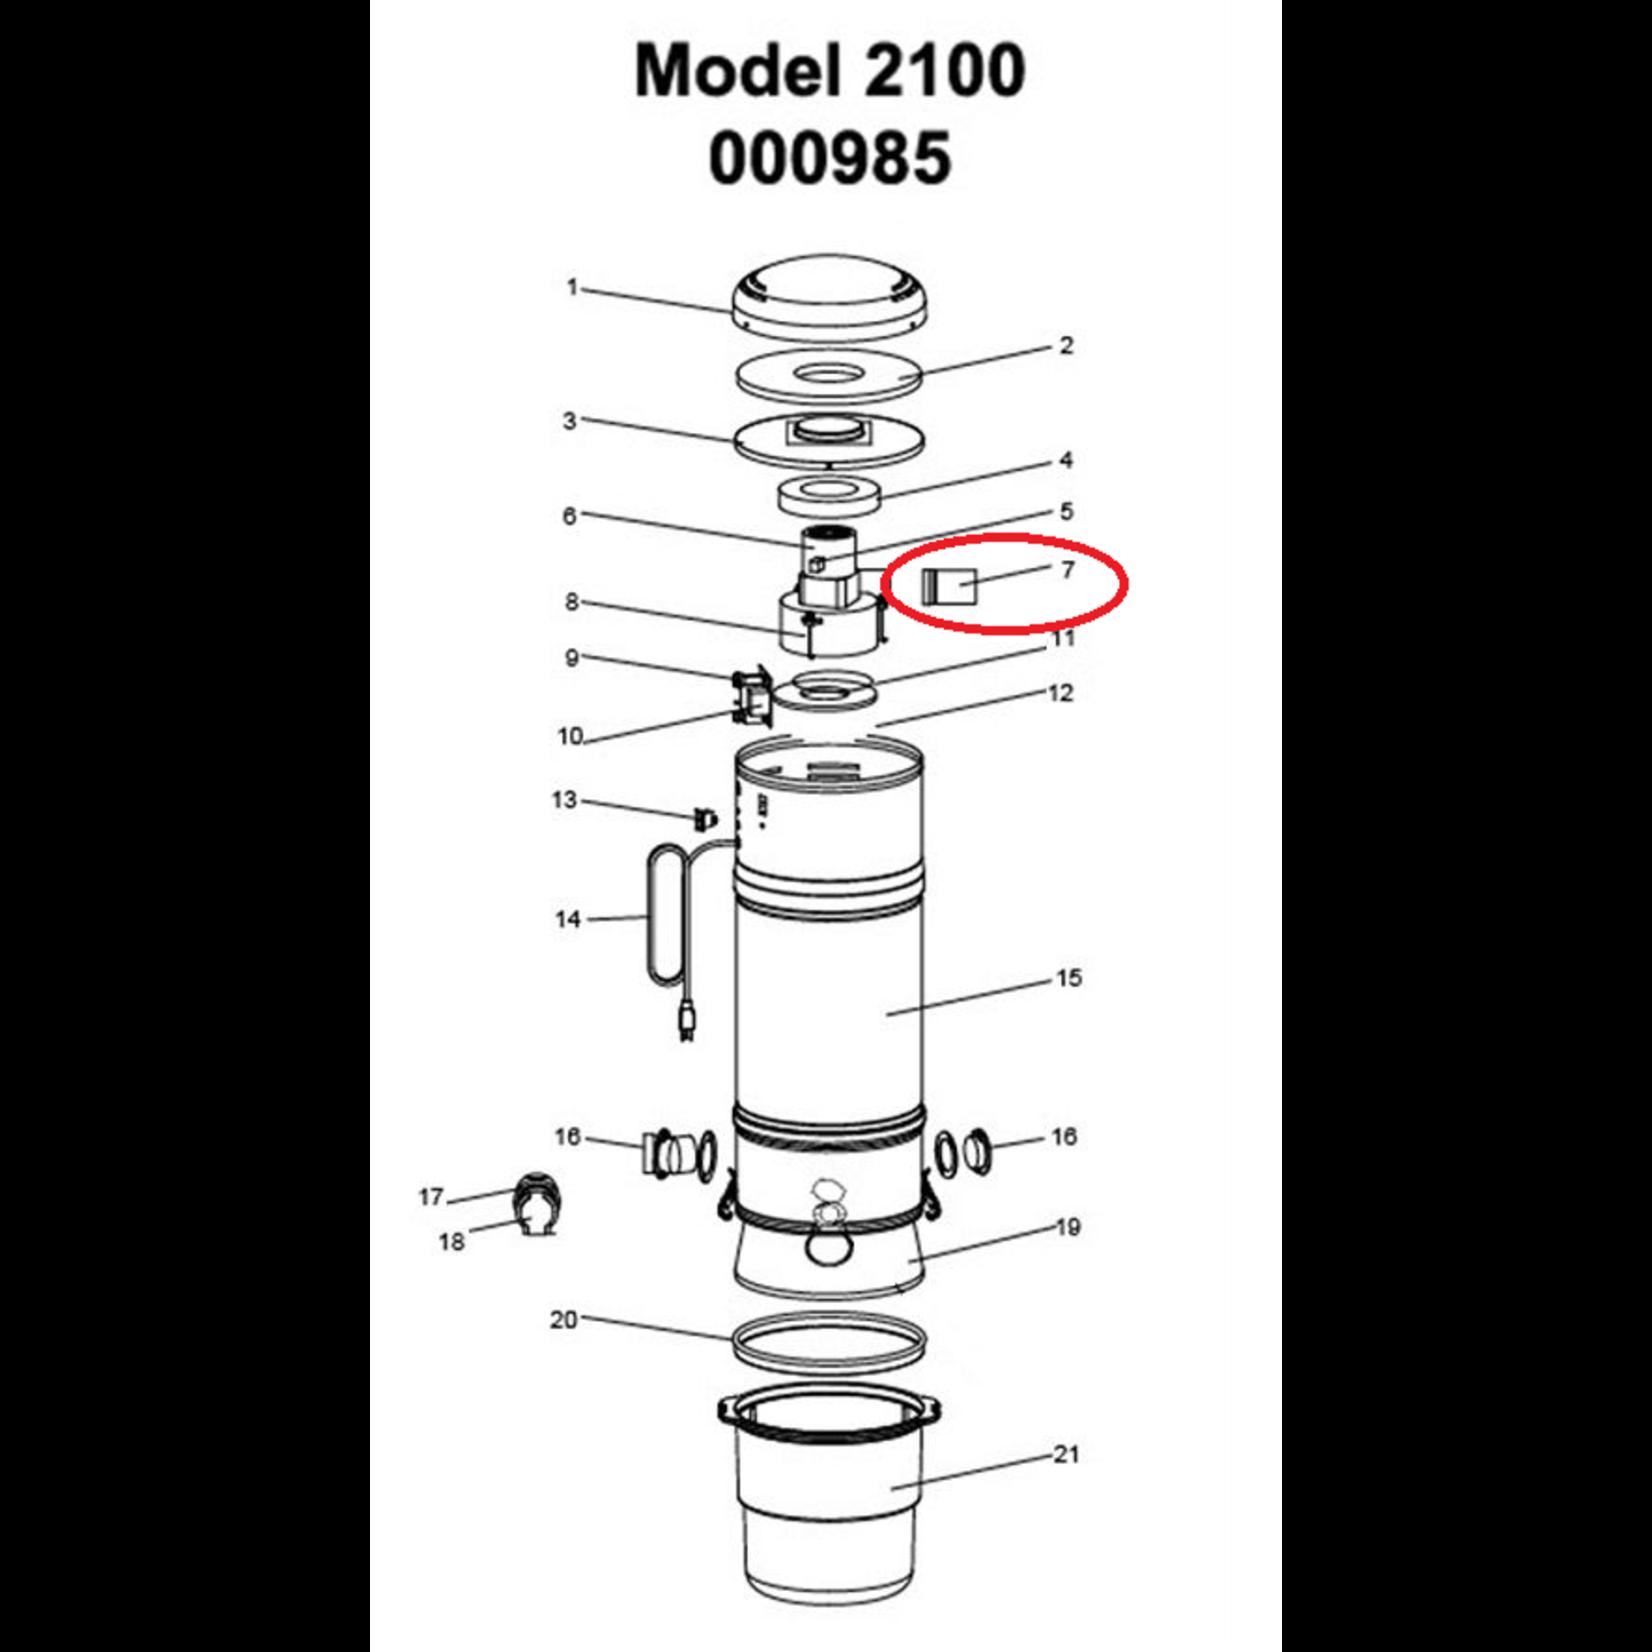 "BEAM BEAM 3.5"" Metal Exhaust Extension"